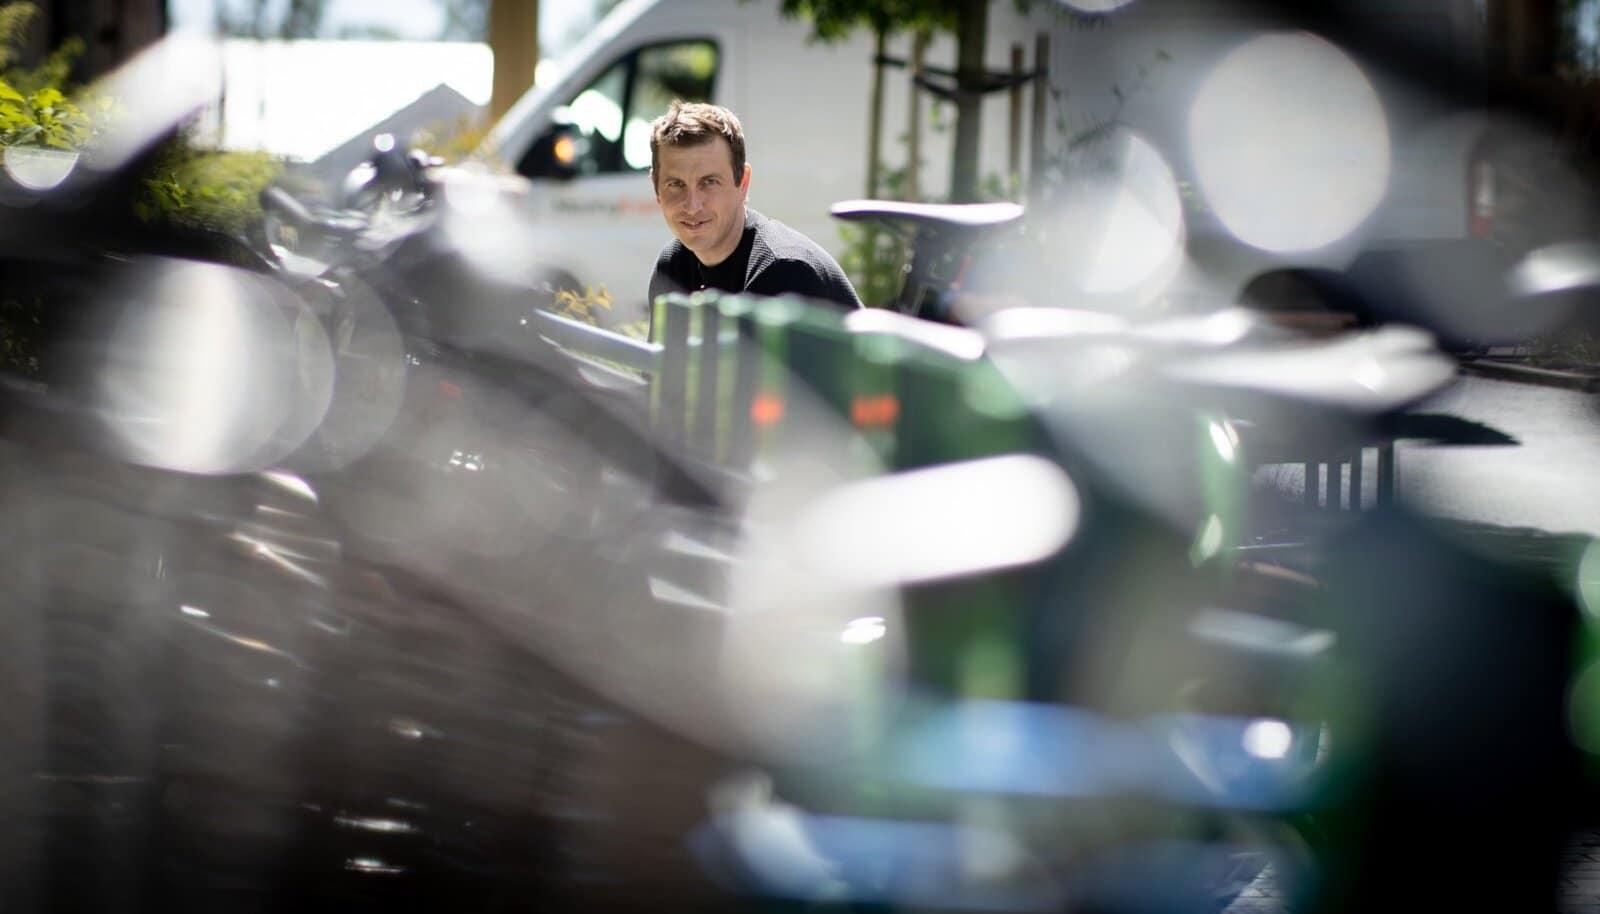 Bikeep CEO on 15-minute cities